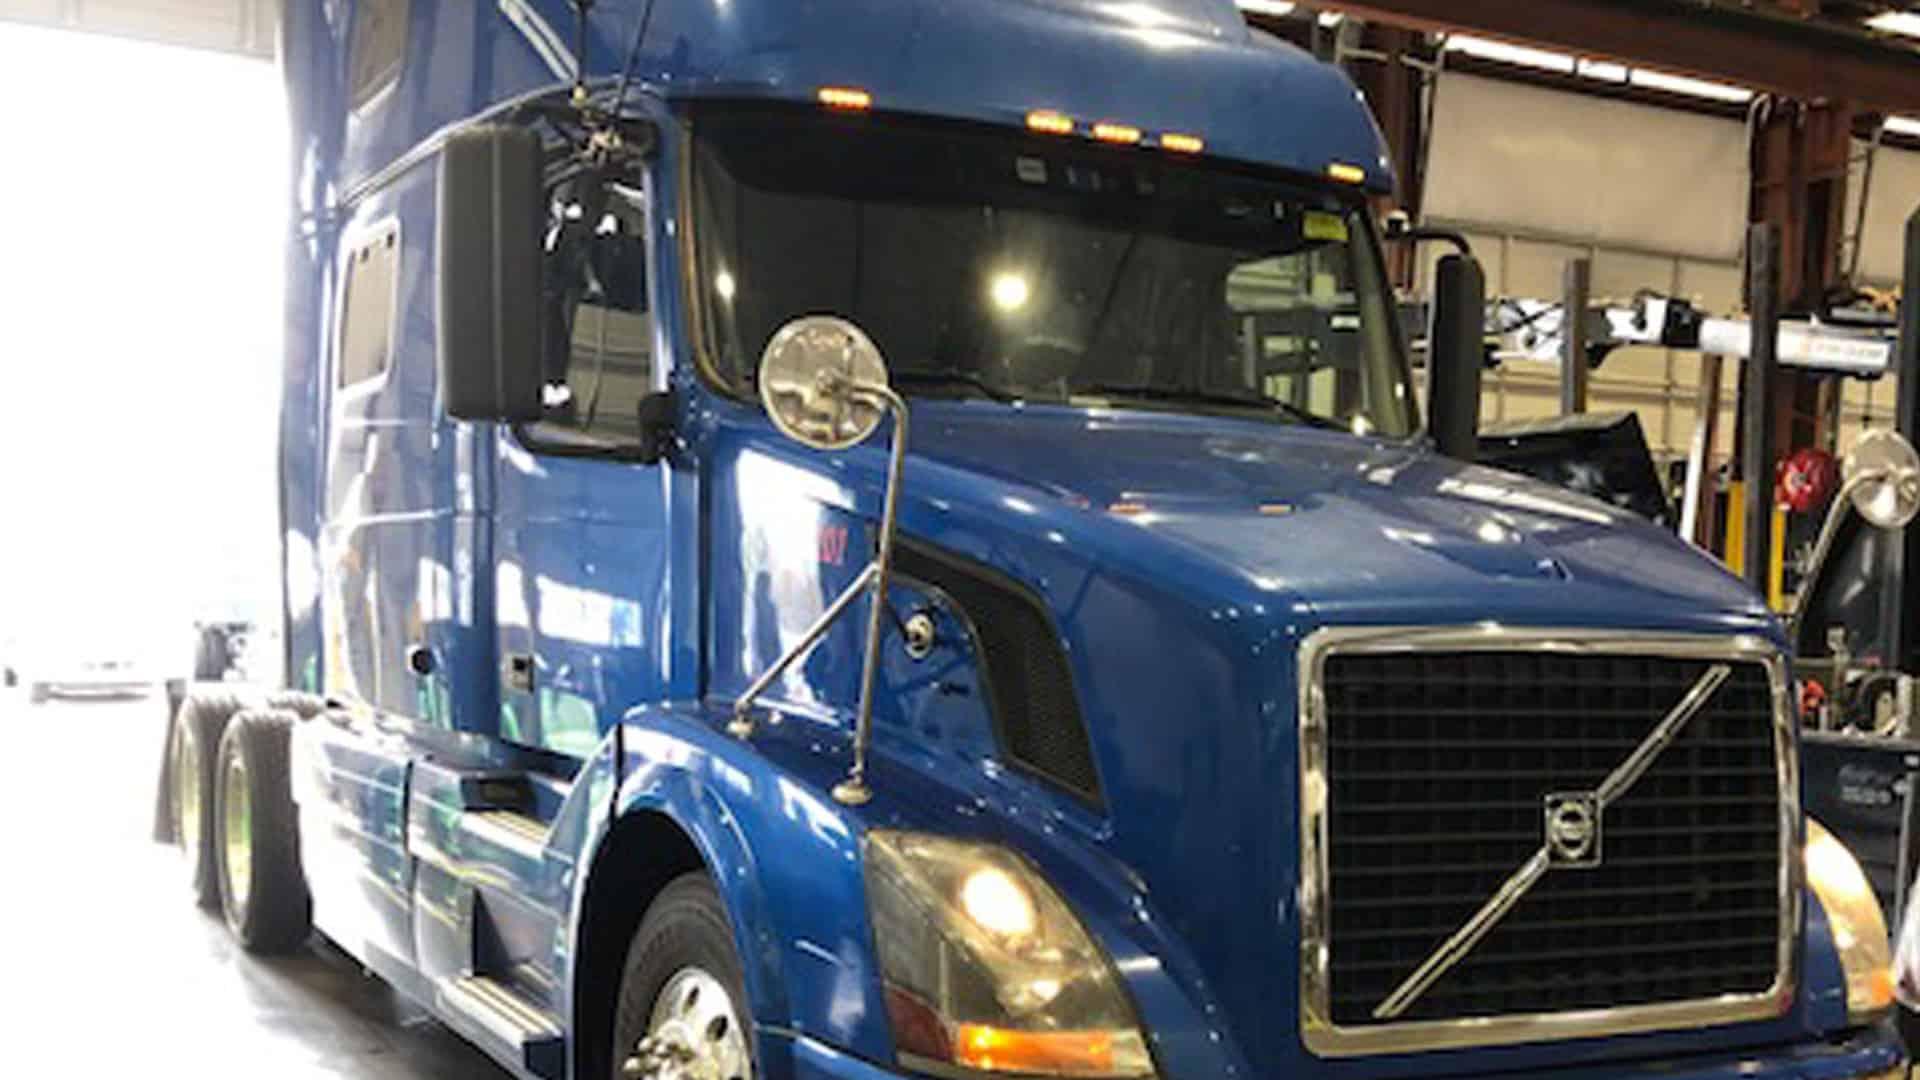 Volvo Engine Overhaul Financing Testimonial from Customer 1